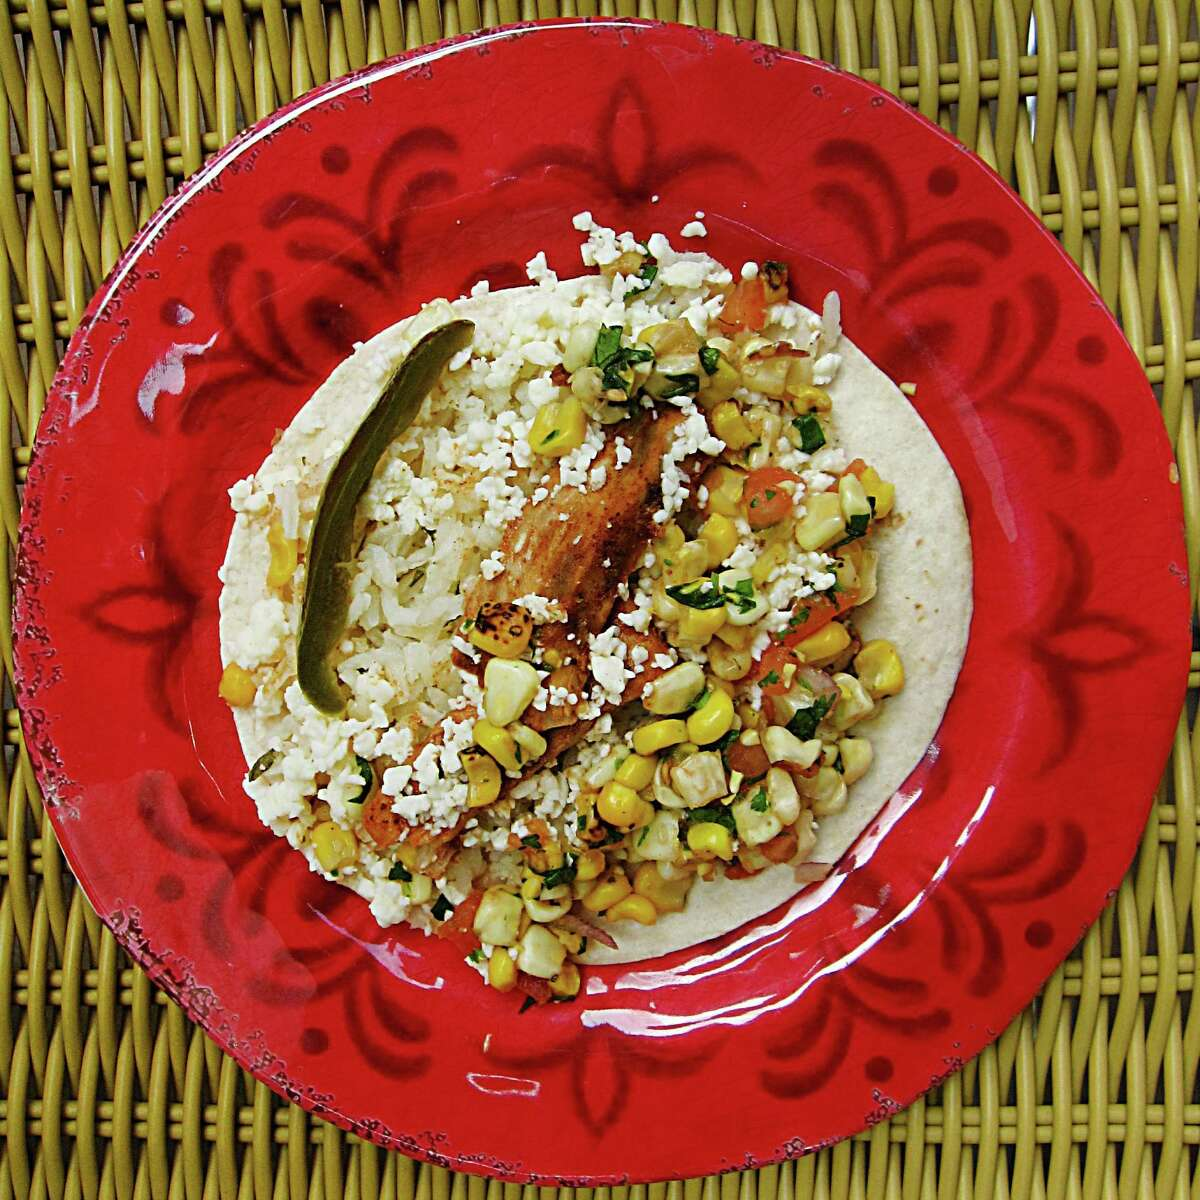 Mahi mahi taco with corn relish, cotija cheese and cilantro-lime rice from Zócalo.